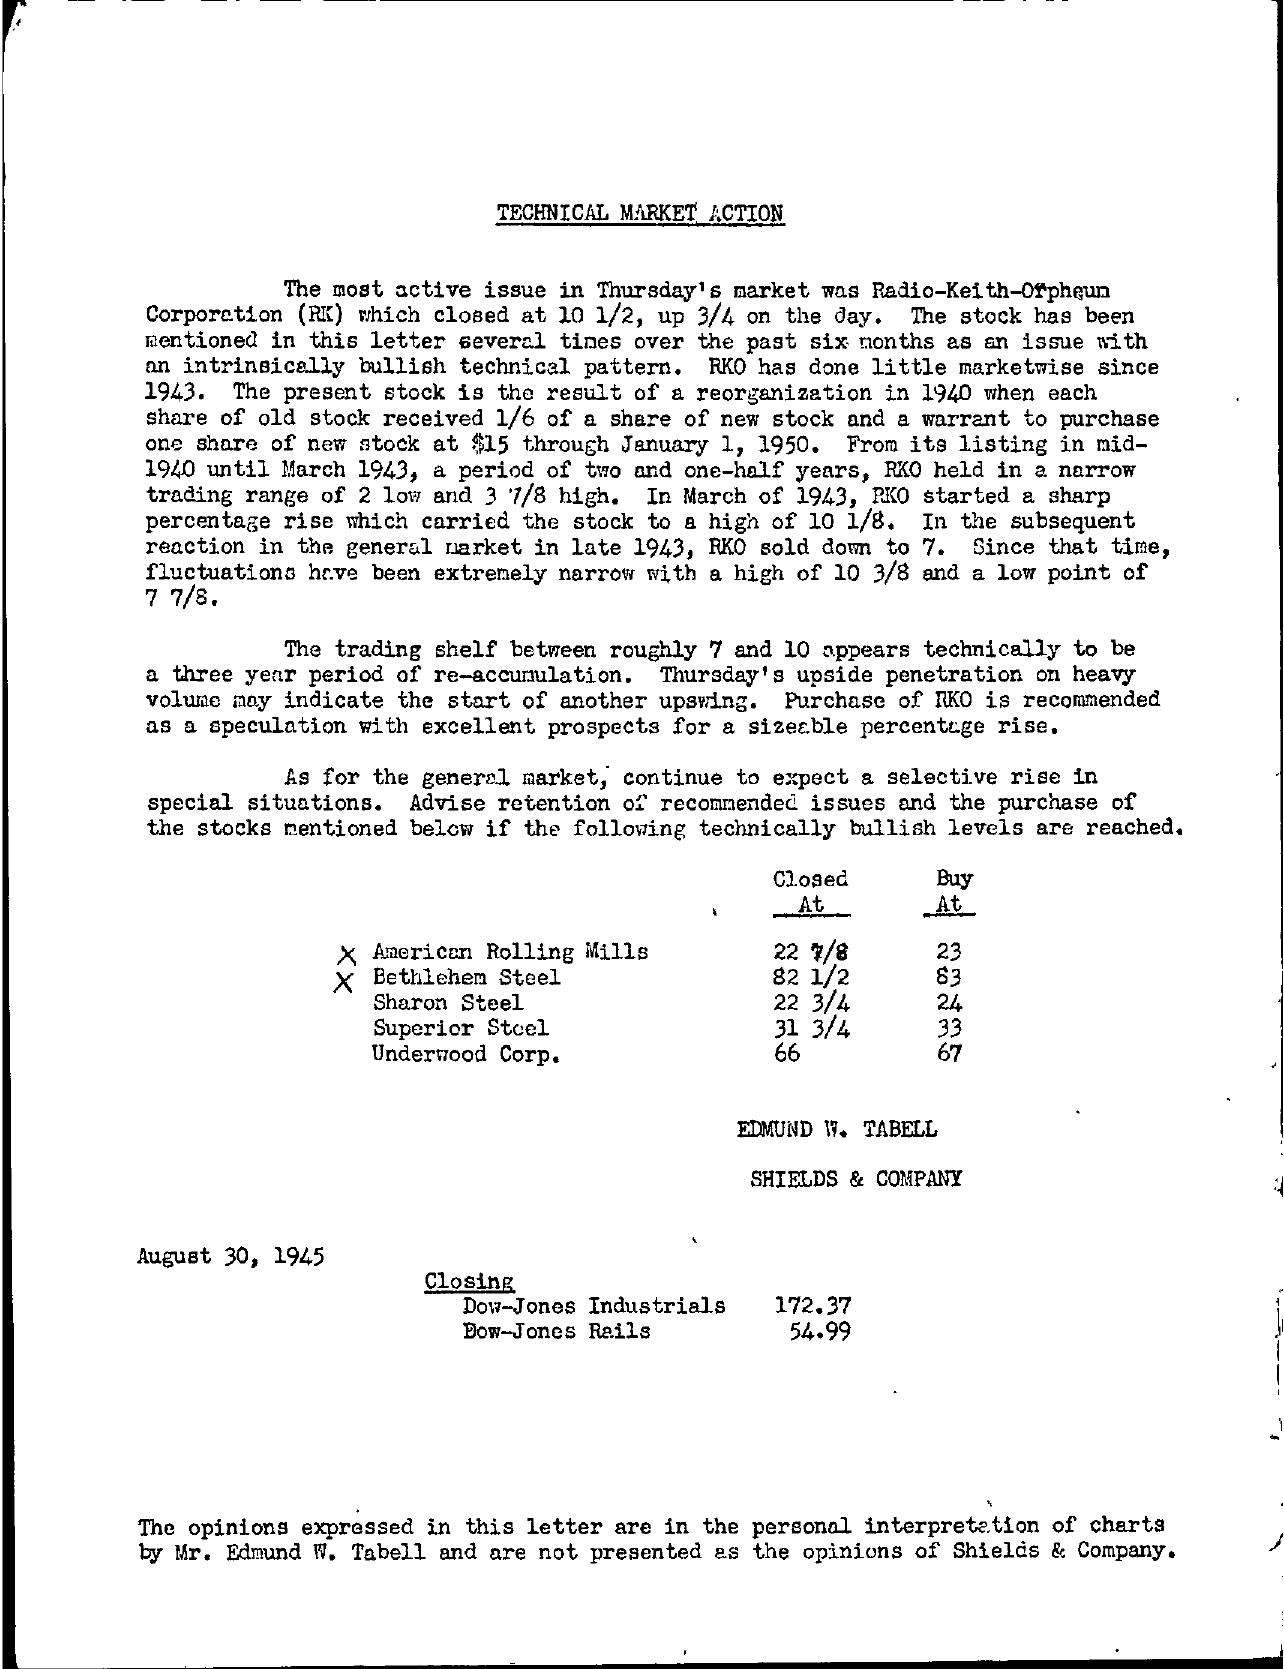 Tabell's Market Letter - August 30, 1945